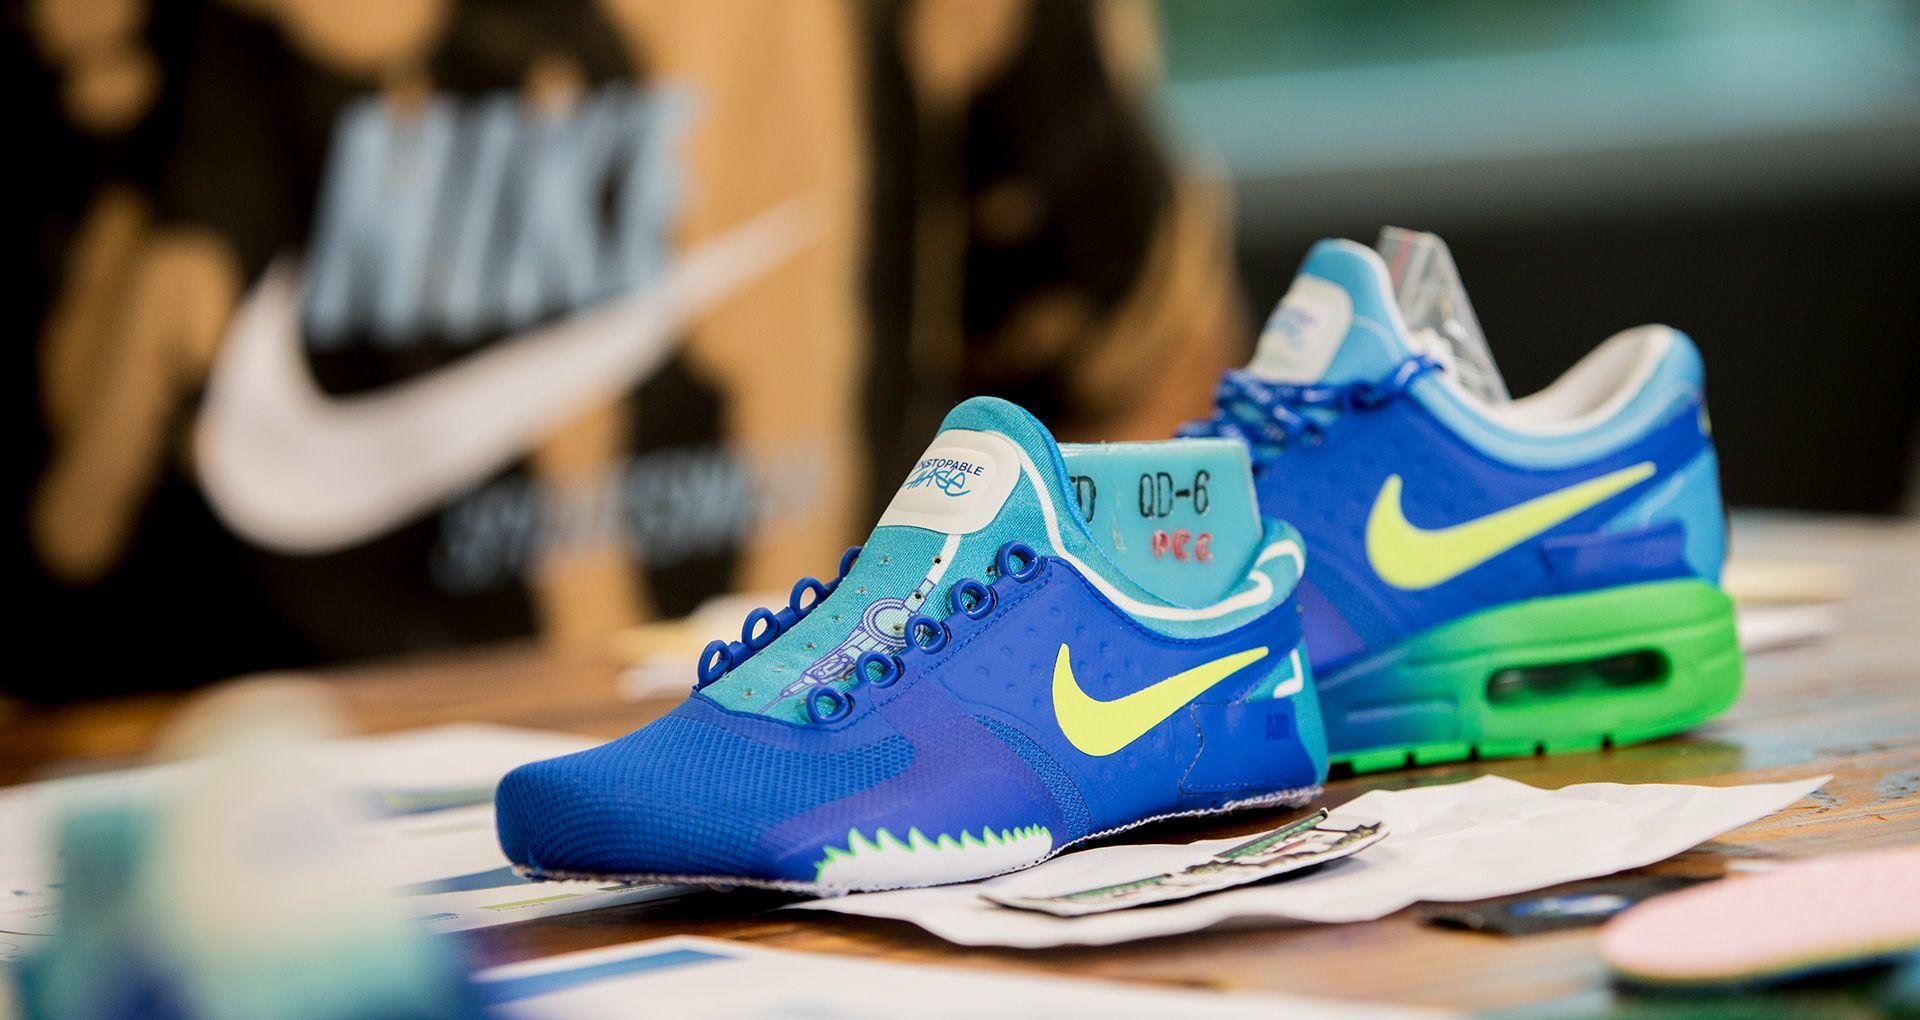 66415146fe37e Behind the Design  Nike Air Max Zero Doernbecher 2016. Nike+ SNKRS